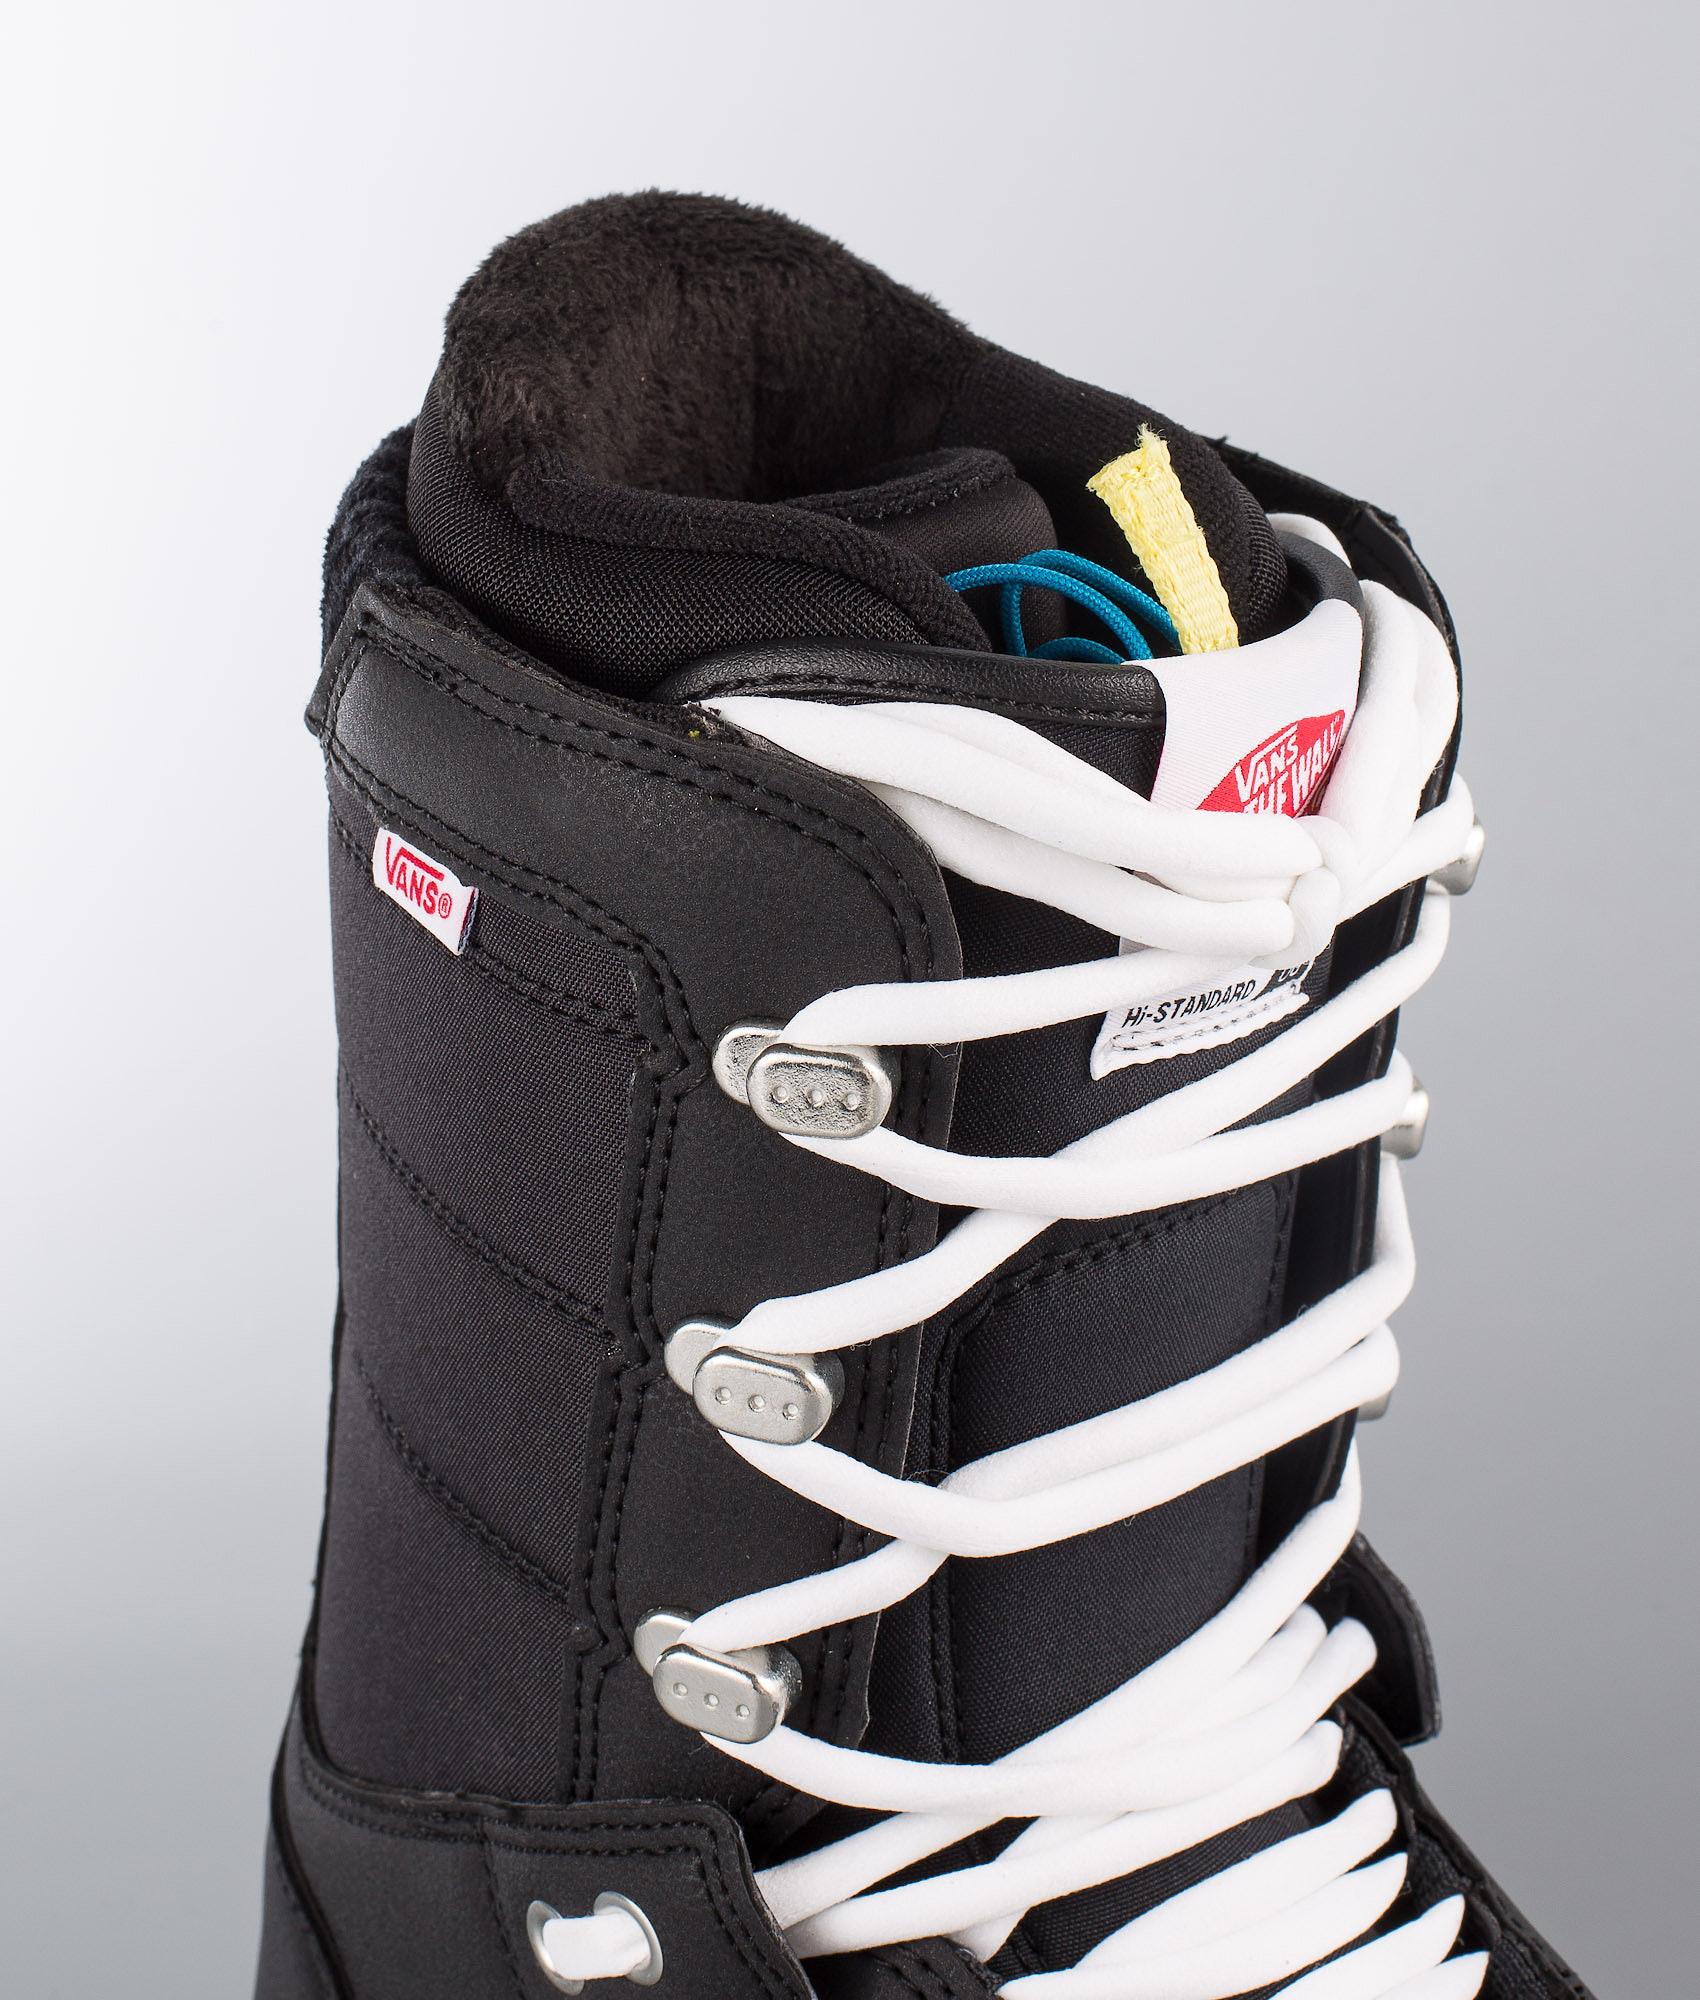 4f316cd7422a Vans Hi-Standard OG W Snowboard Boots Black White - Ridestore.com